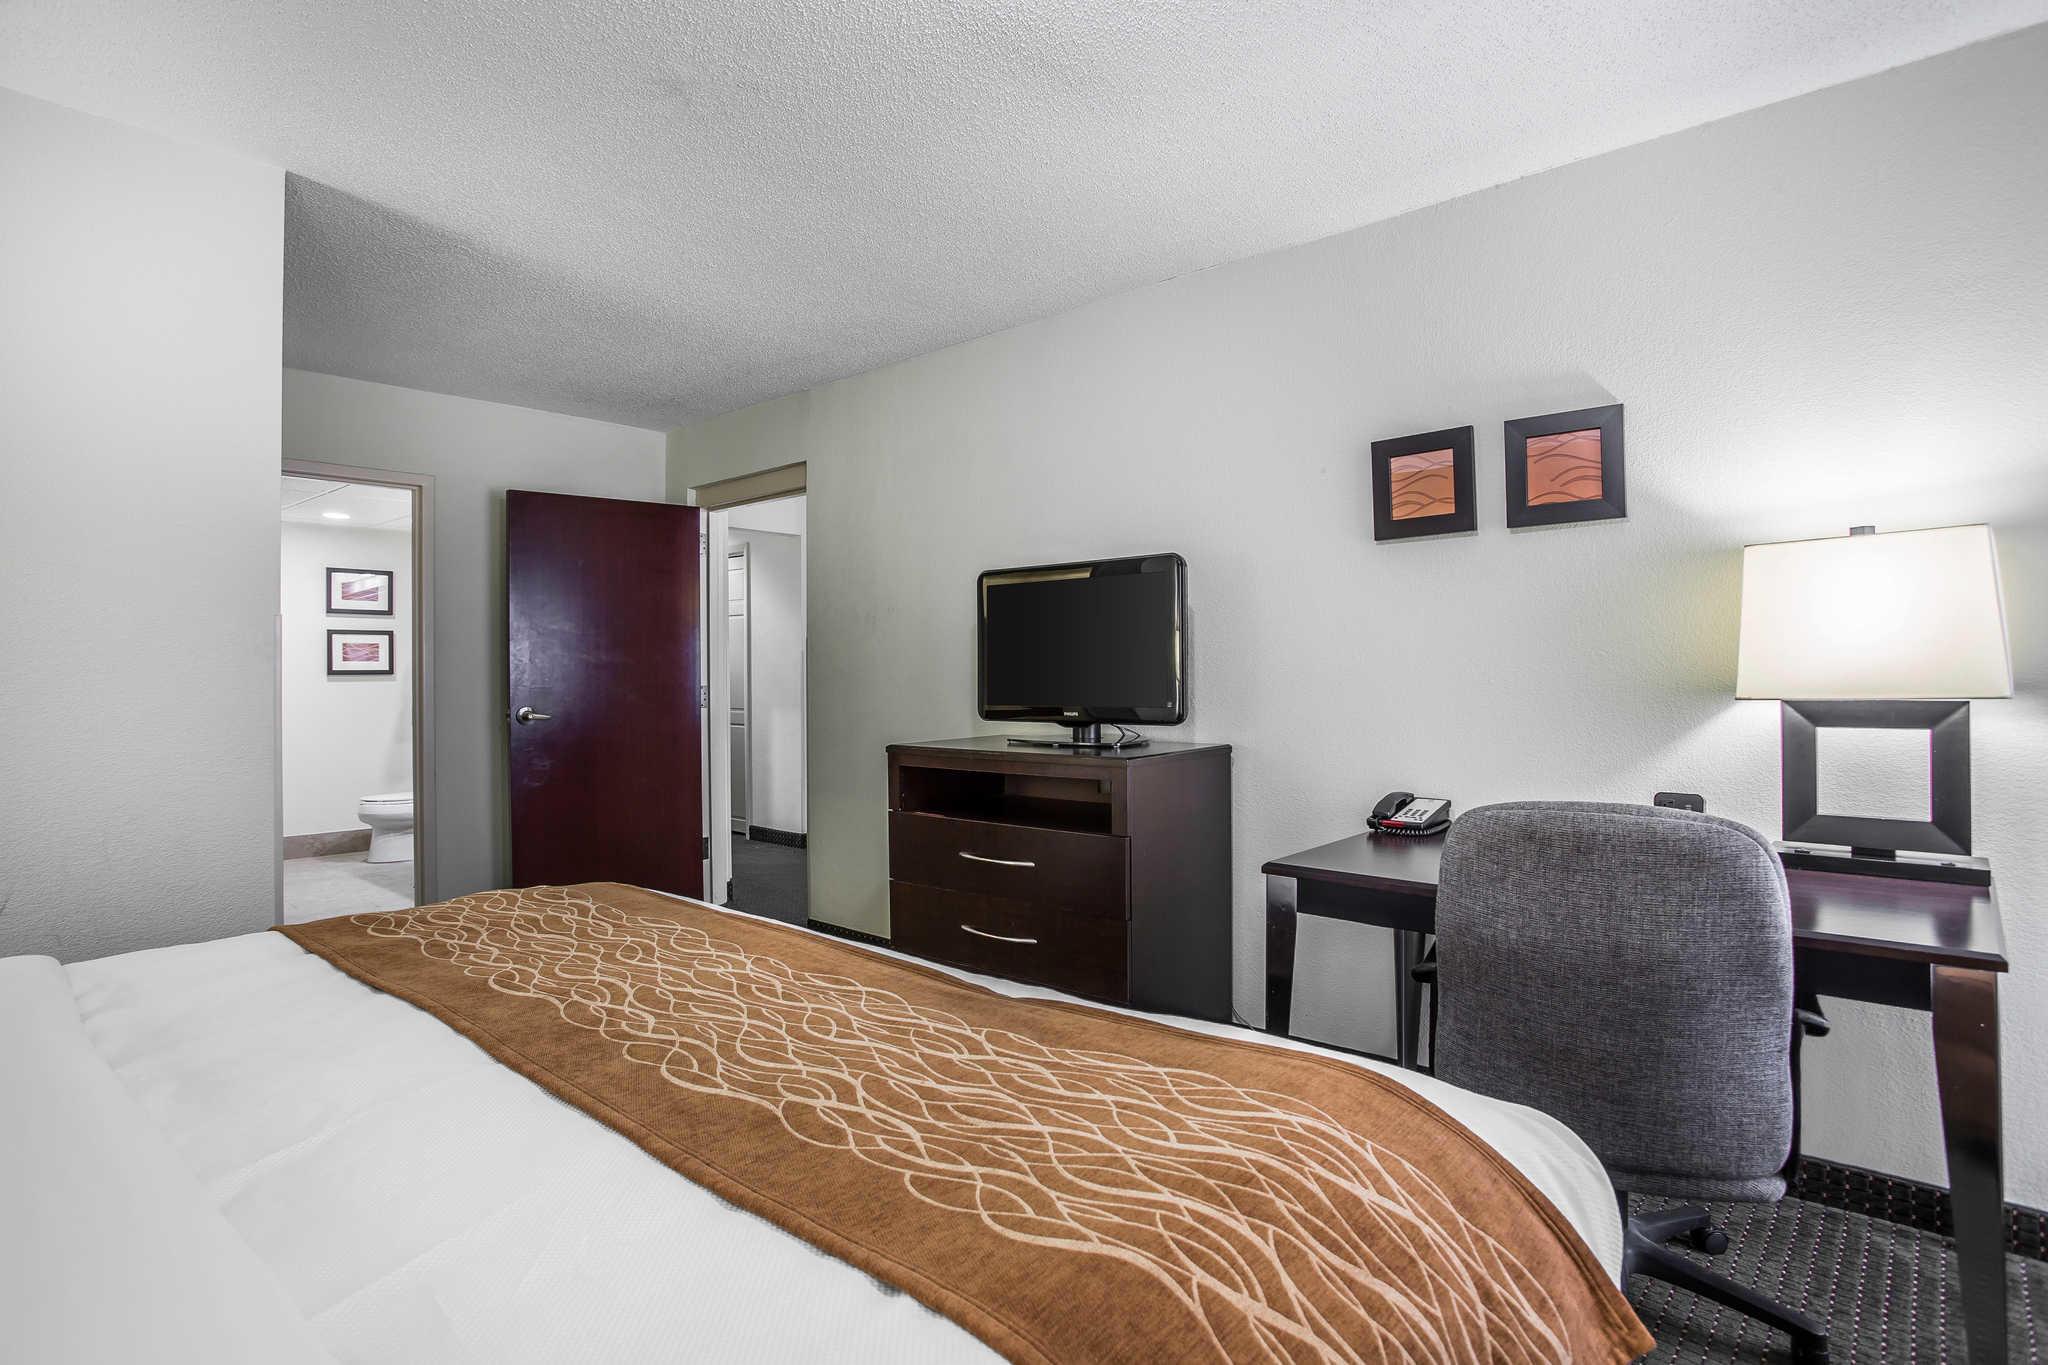 Comfort Inn & Suites Lake Norman image 20